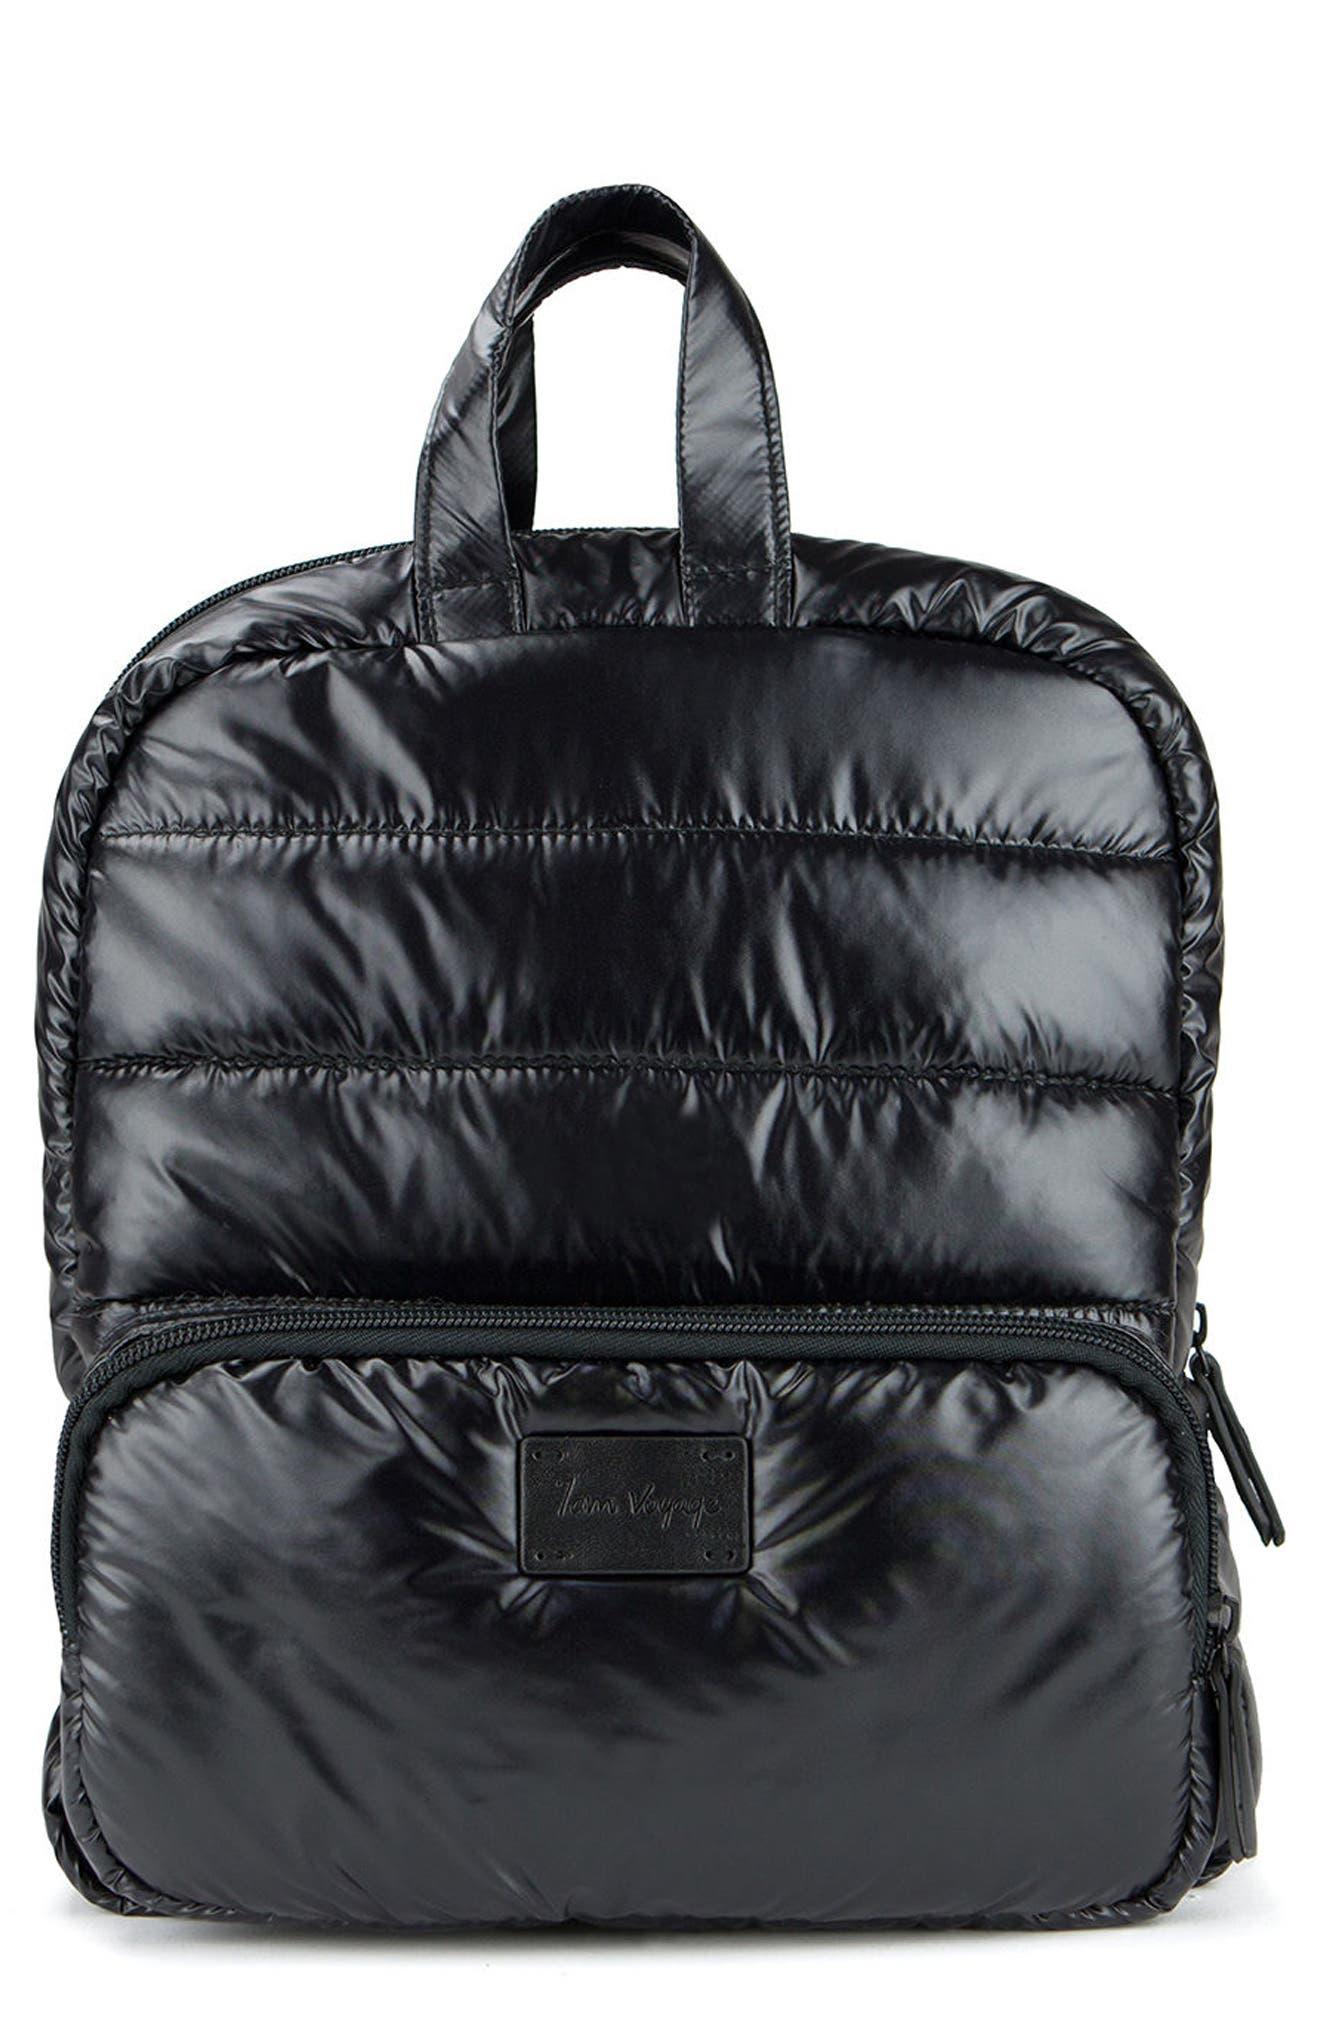 Mini Water Repellent Backpack,                             Main thumbnail 1, color,                             001